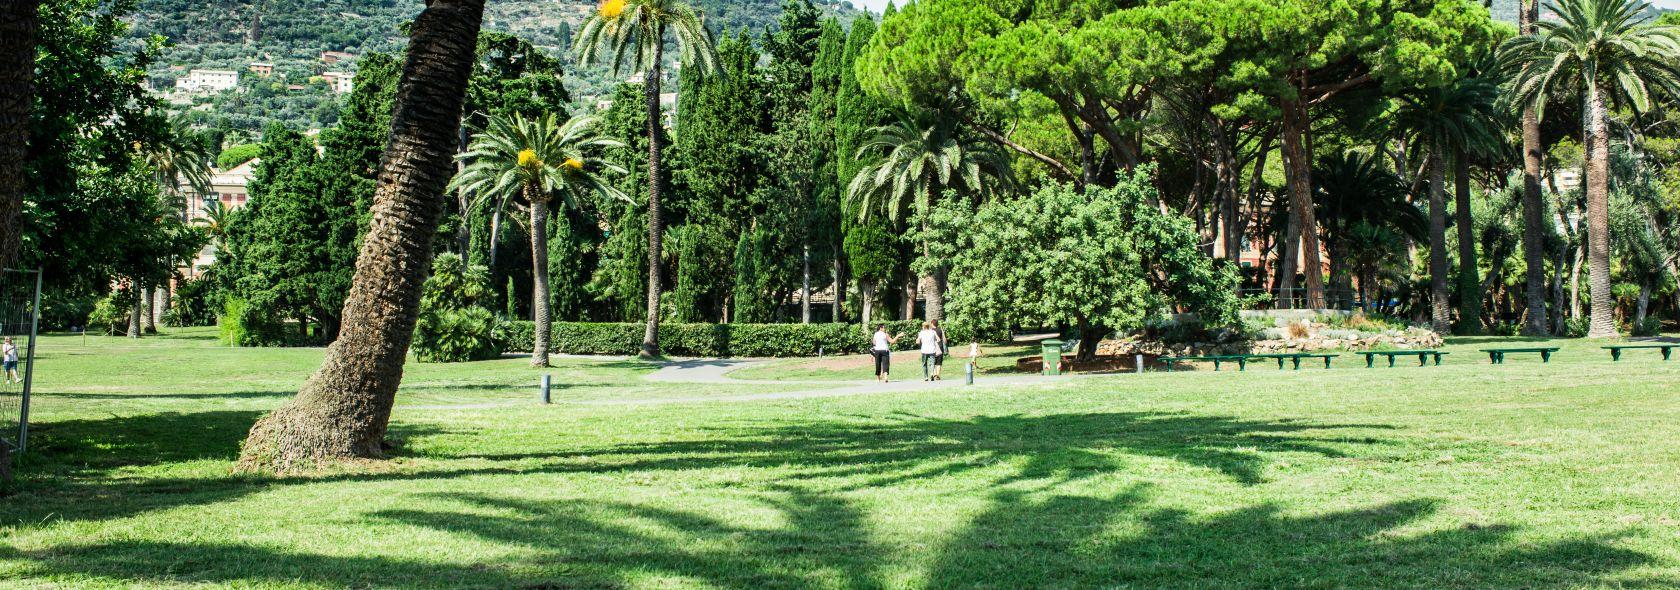 Parchi di Nervi - Foto Ufficio Comunicazione Città Metropolitana